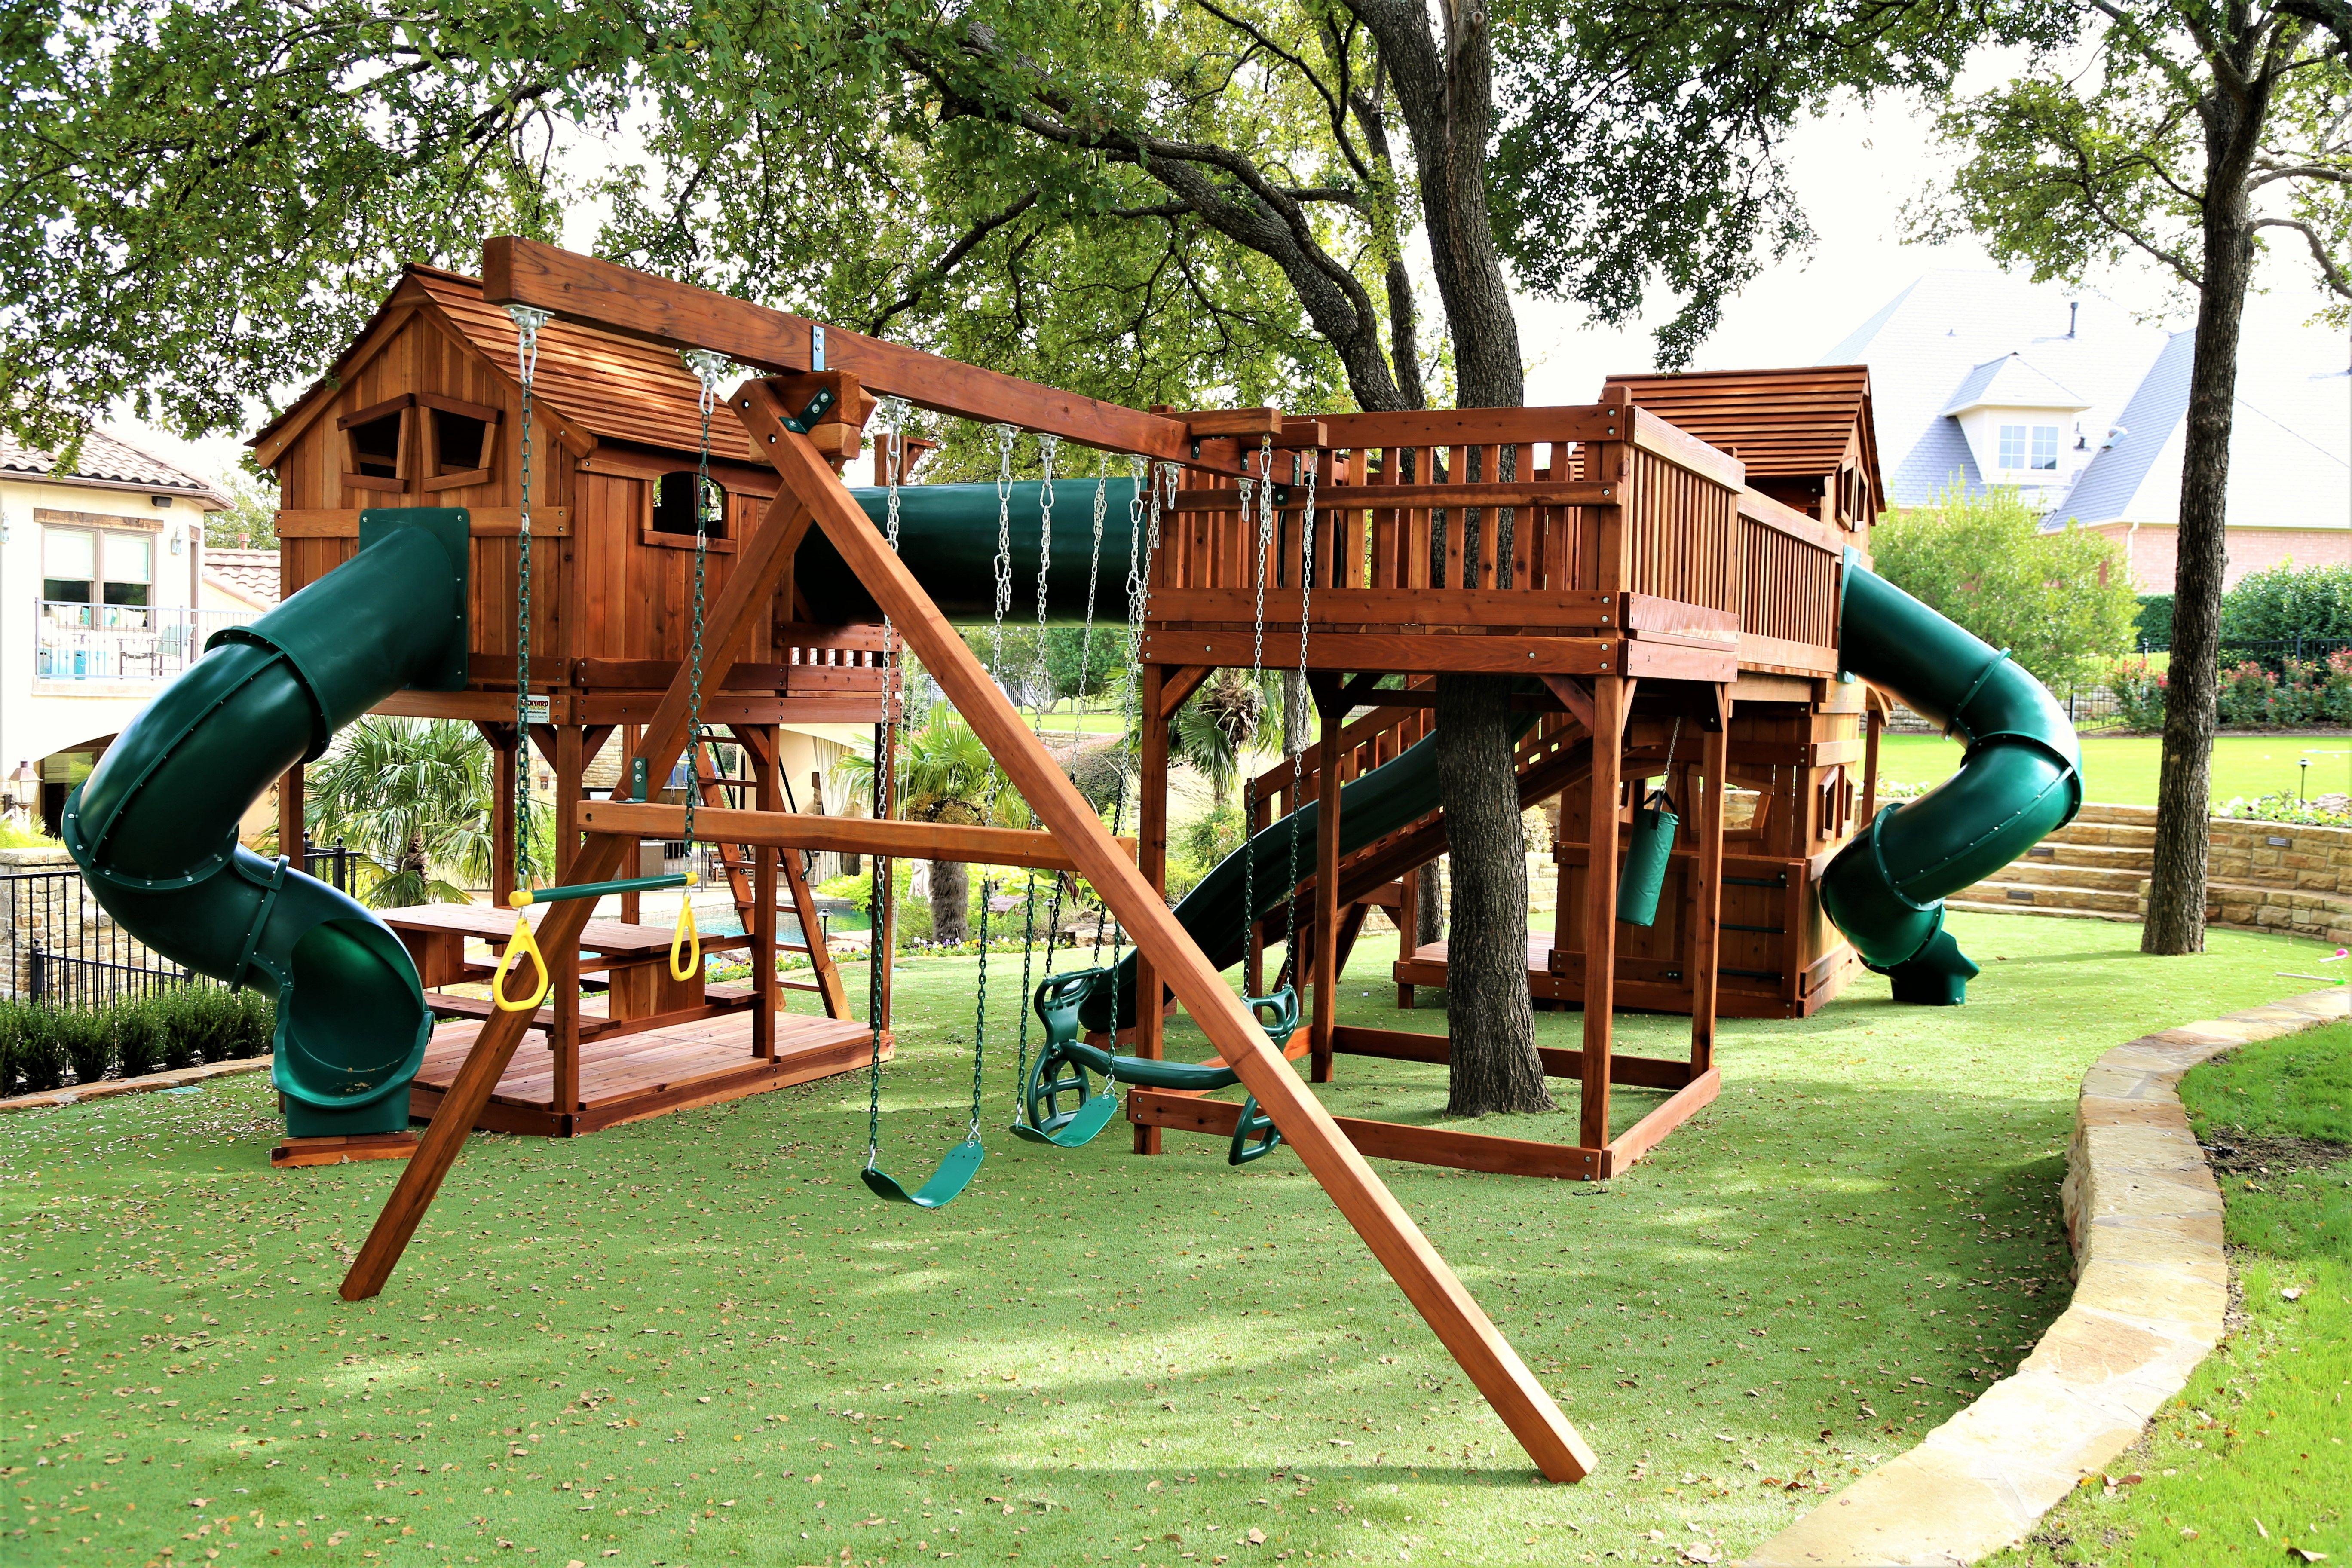 Redwood Custom Play Set Shown W 5 Slides Crawl Tube And 2 Fort Stockton Playsets With A Custom Tree Platfo Backyard Playground Playground Design Backyard Play